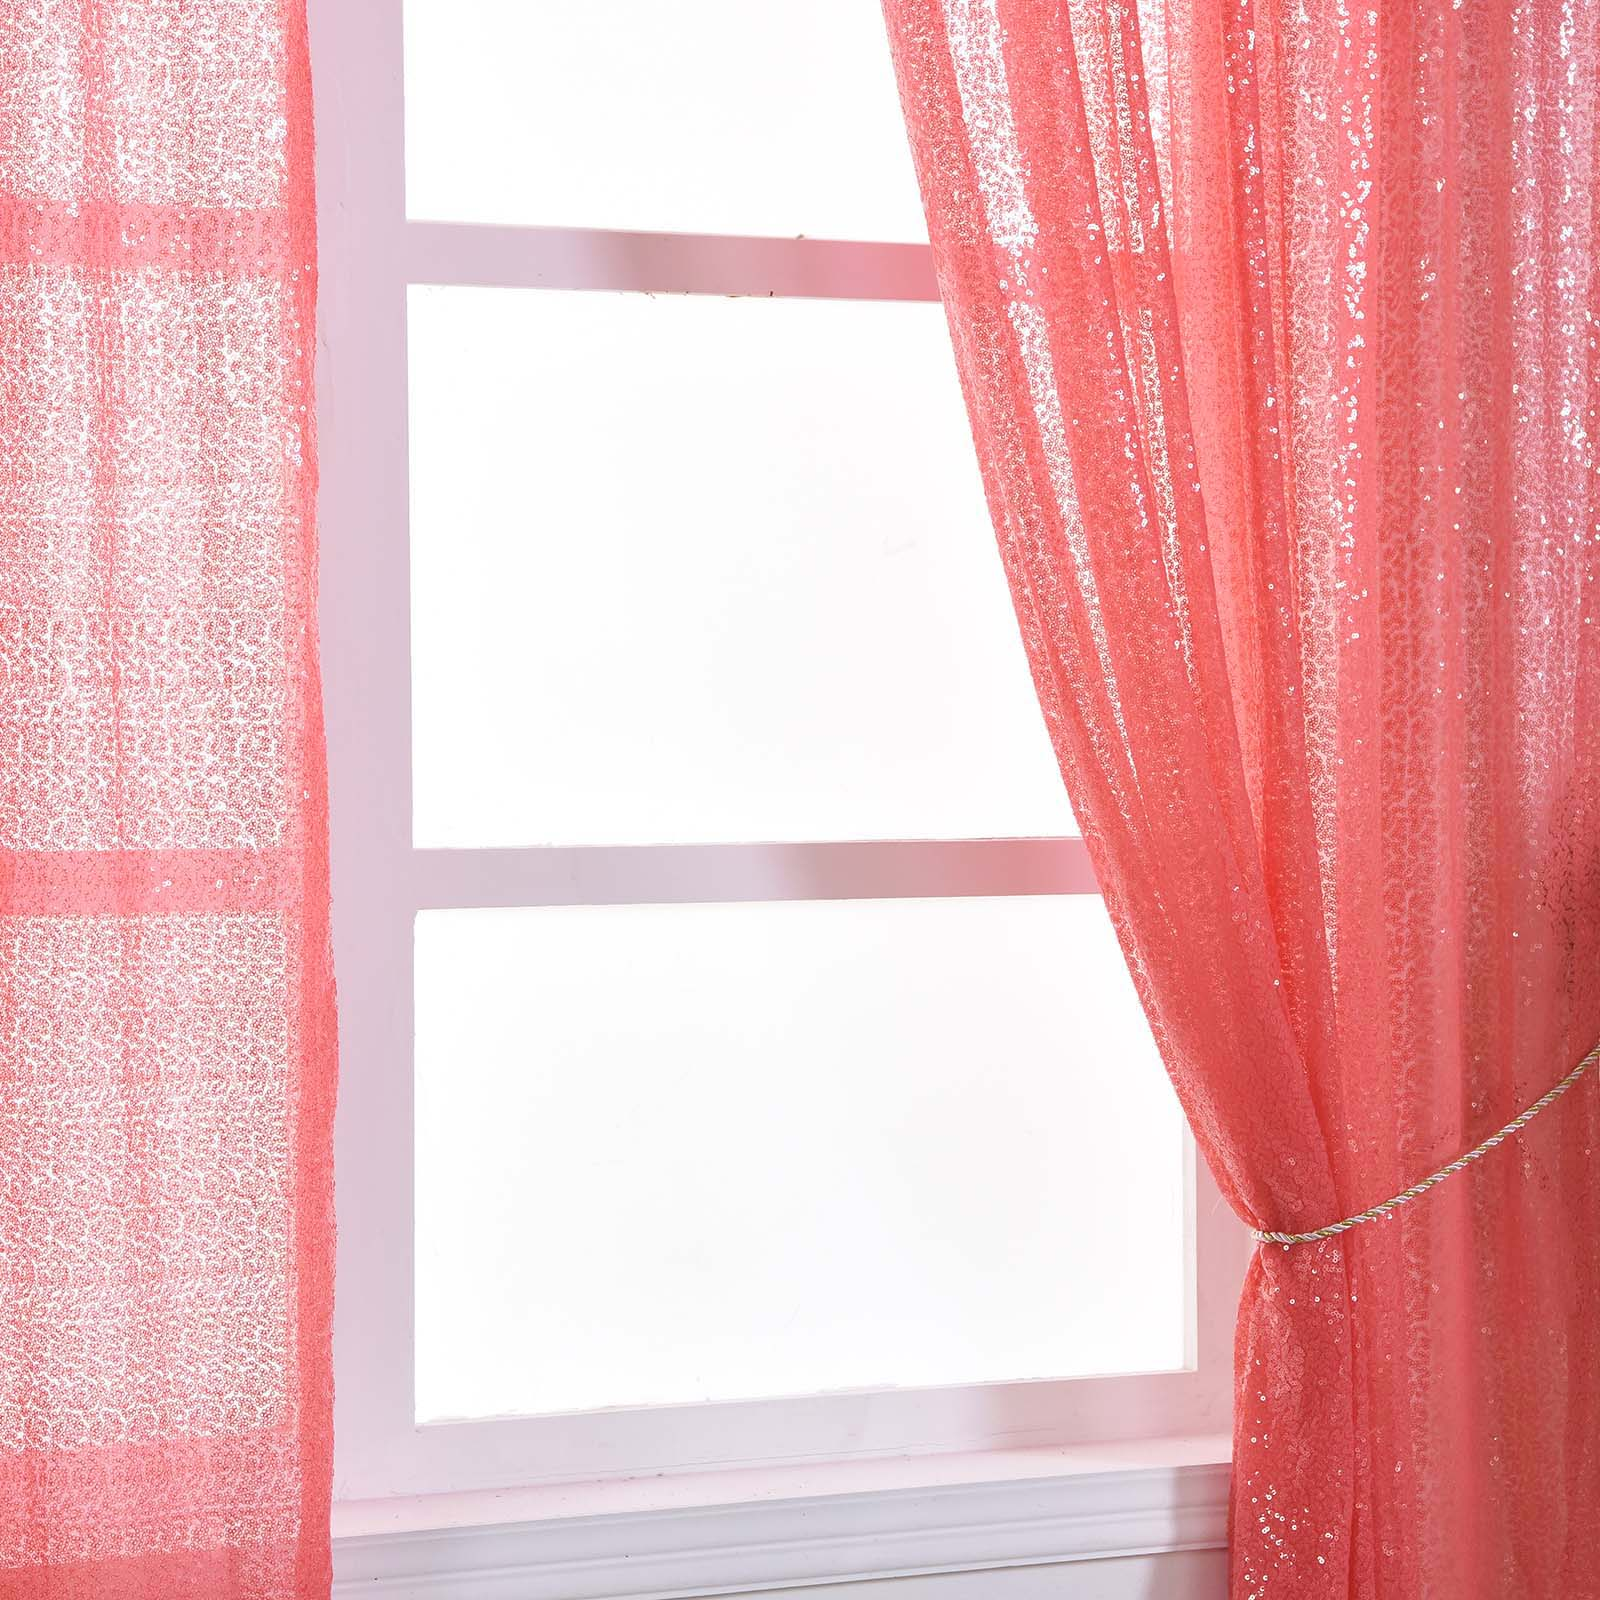 4-pcs-52-034-x-84-034-Sequined-Window-Curtains-Drapes-Panels-Backdrop-Home-Party-Decor thumbnail 23